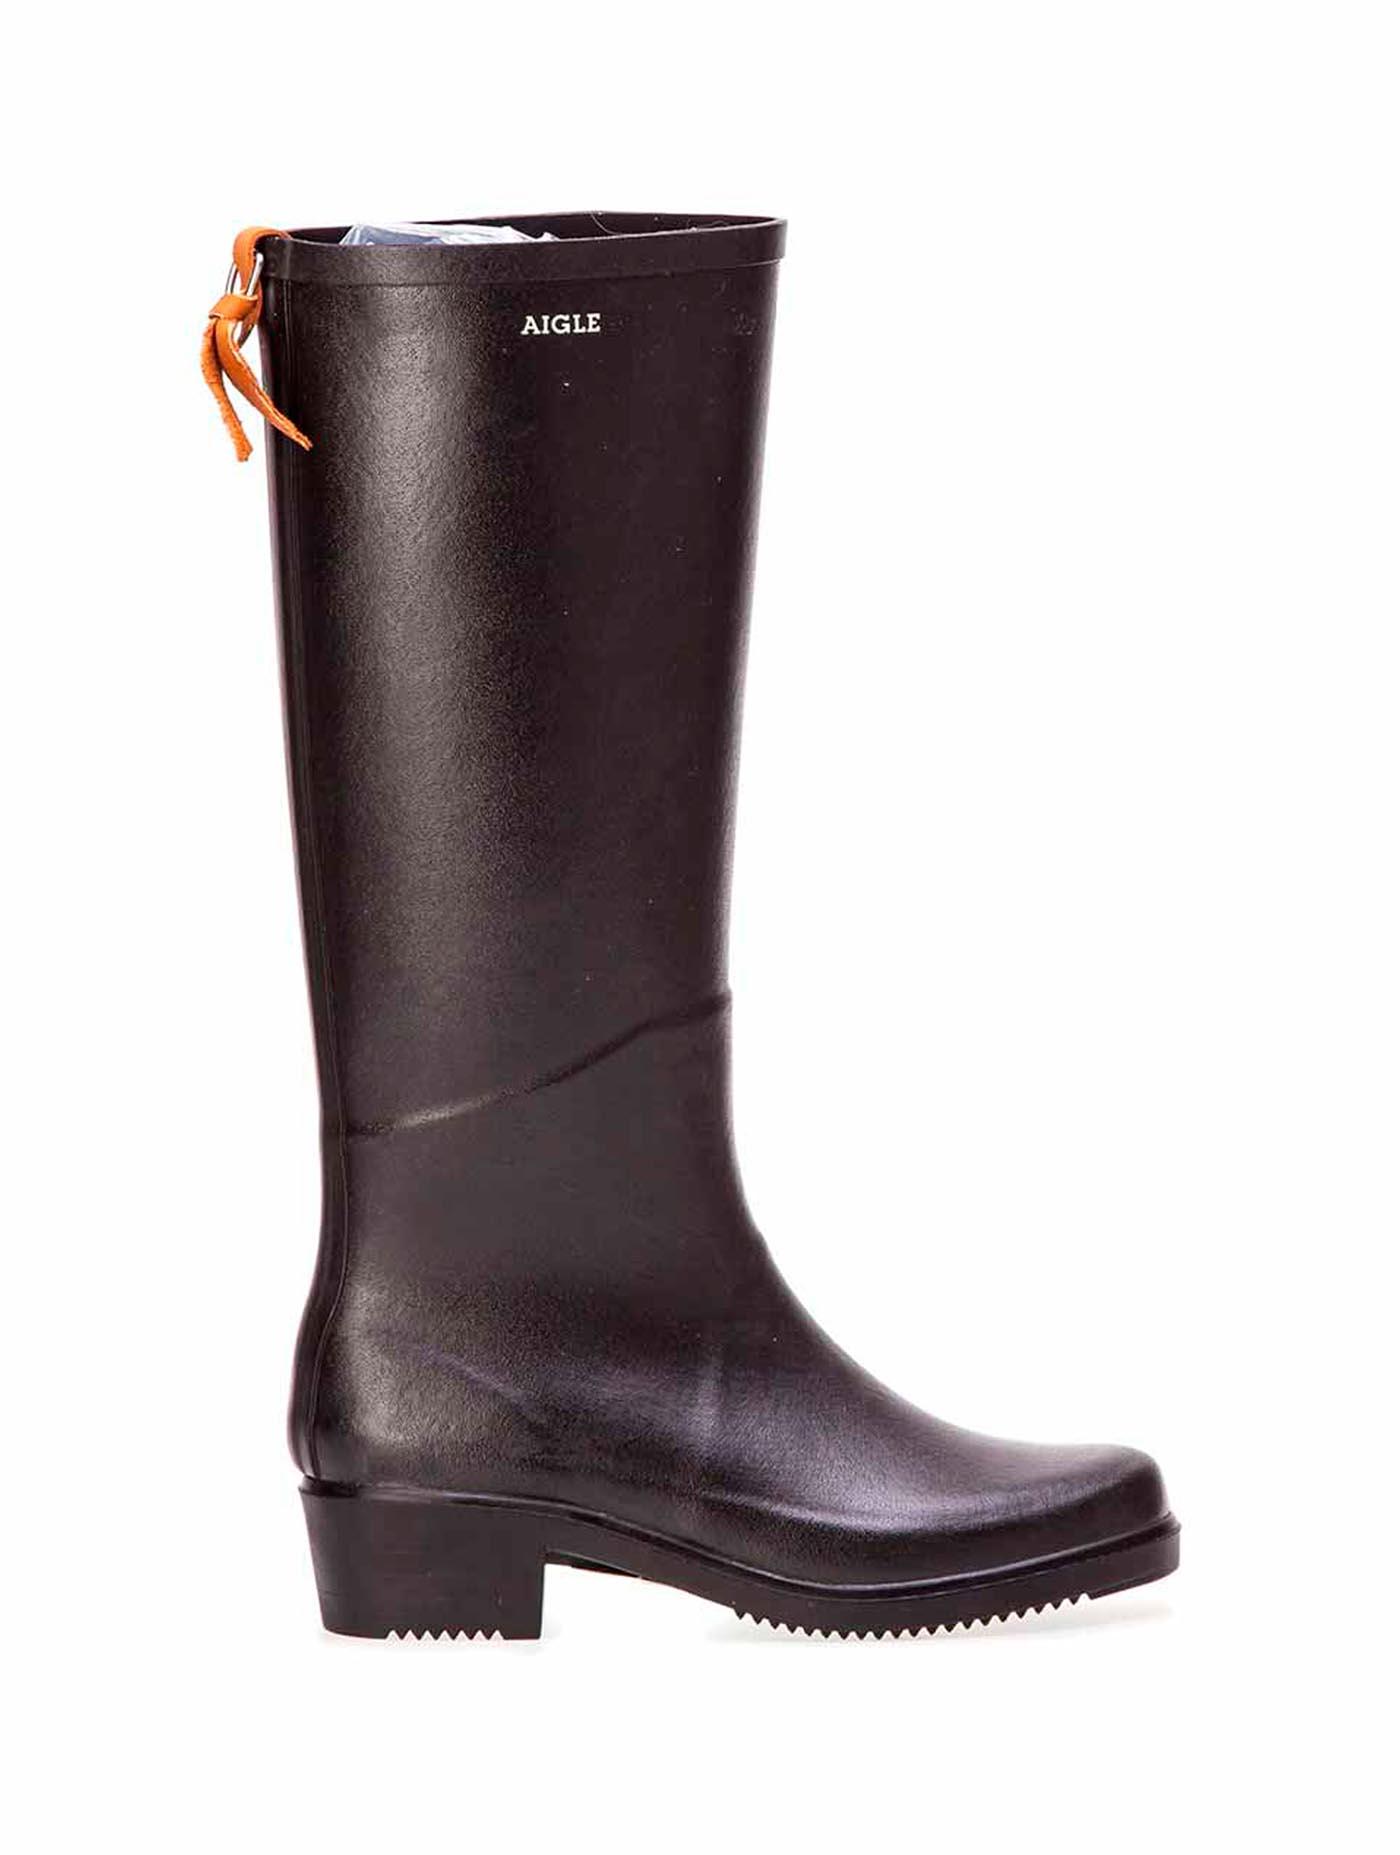 JULIETTEWomen's MISS MISS rubber rubber boots NoirAiglewomenAIGLE boots NoirAiglewomenAIGLE MISS JULIETTEWomen's rxBodCWe